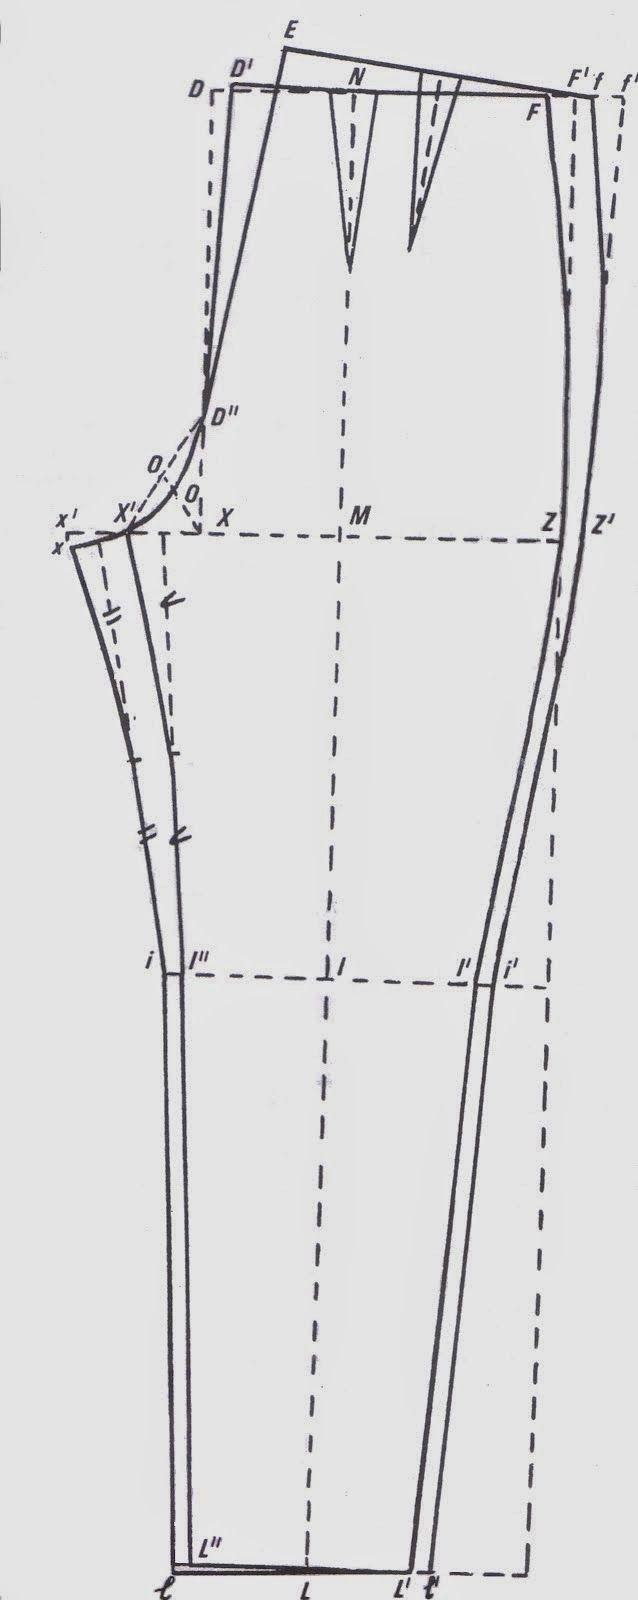 Membuat Celana Akan Terasa Mudah Kalau Anda Tau Kuncinya Kunci Itu Sendiri Terdiri Dari Rumus Untuk Menentukan Ukuran Pola Celana Pembuatan Pola Celana Wanita